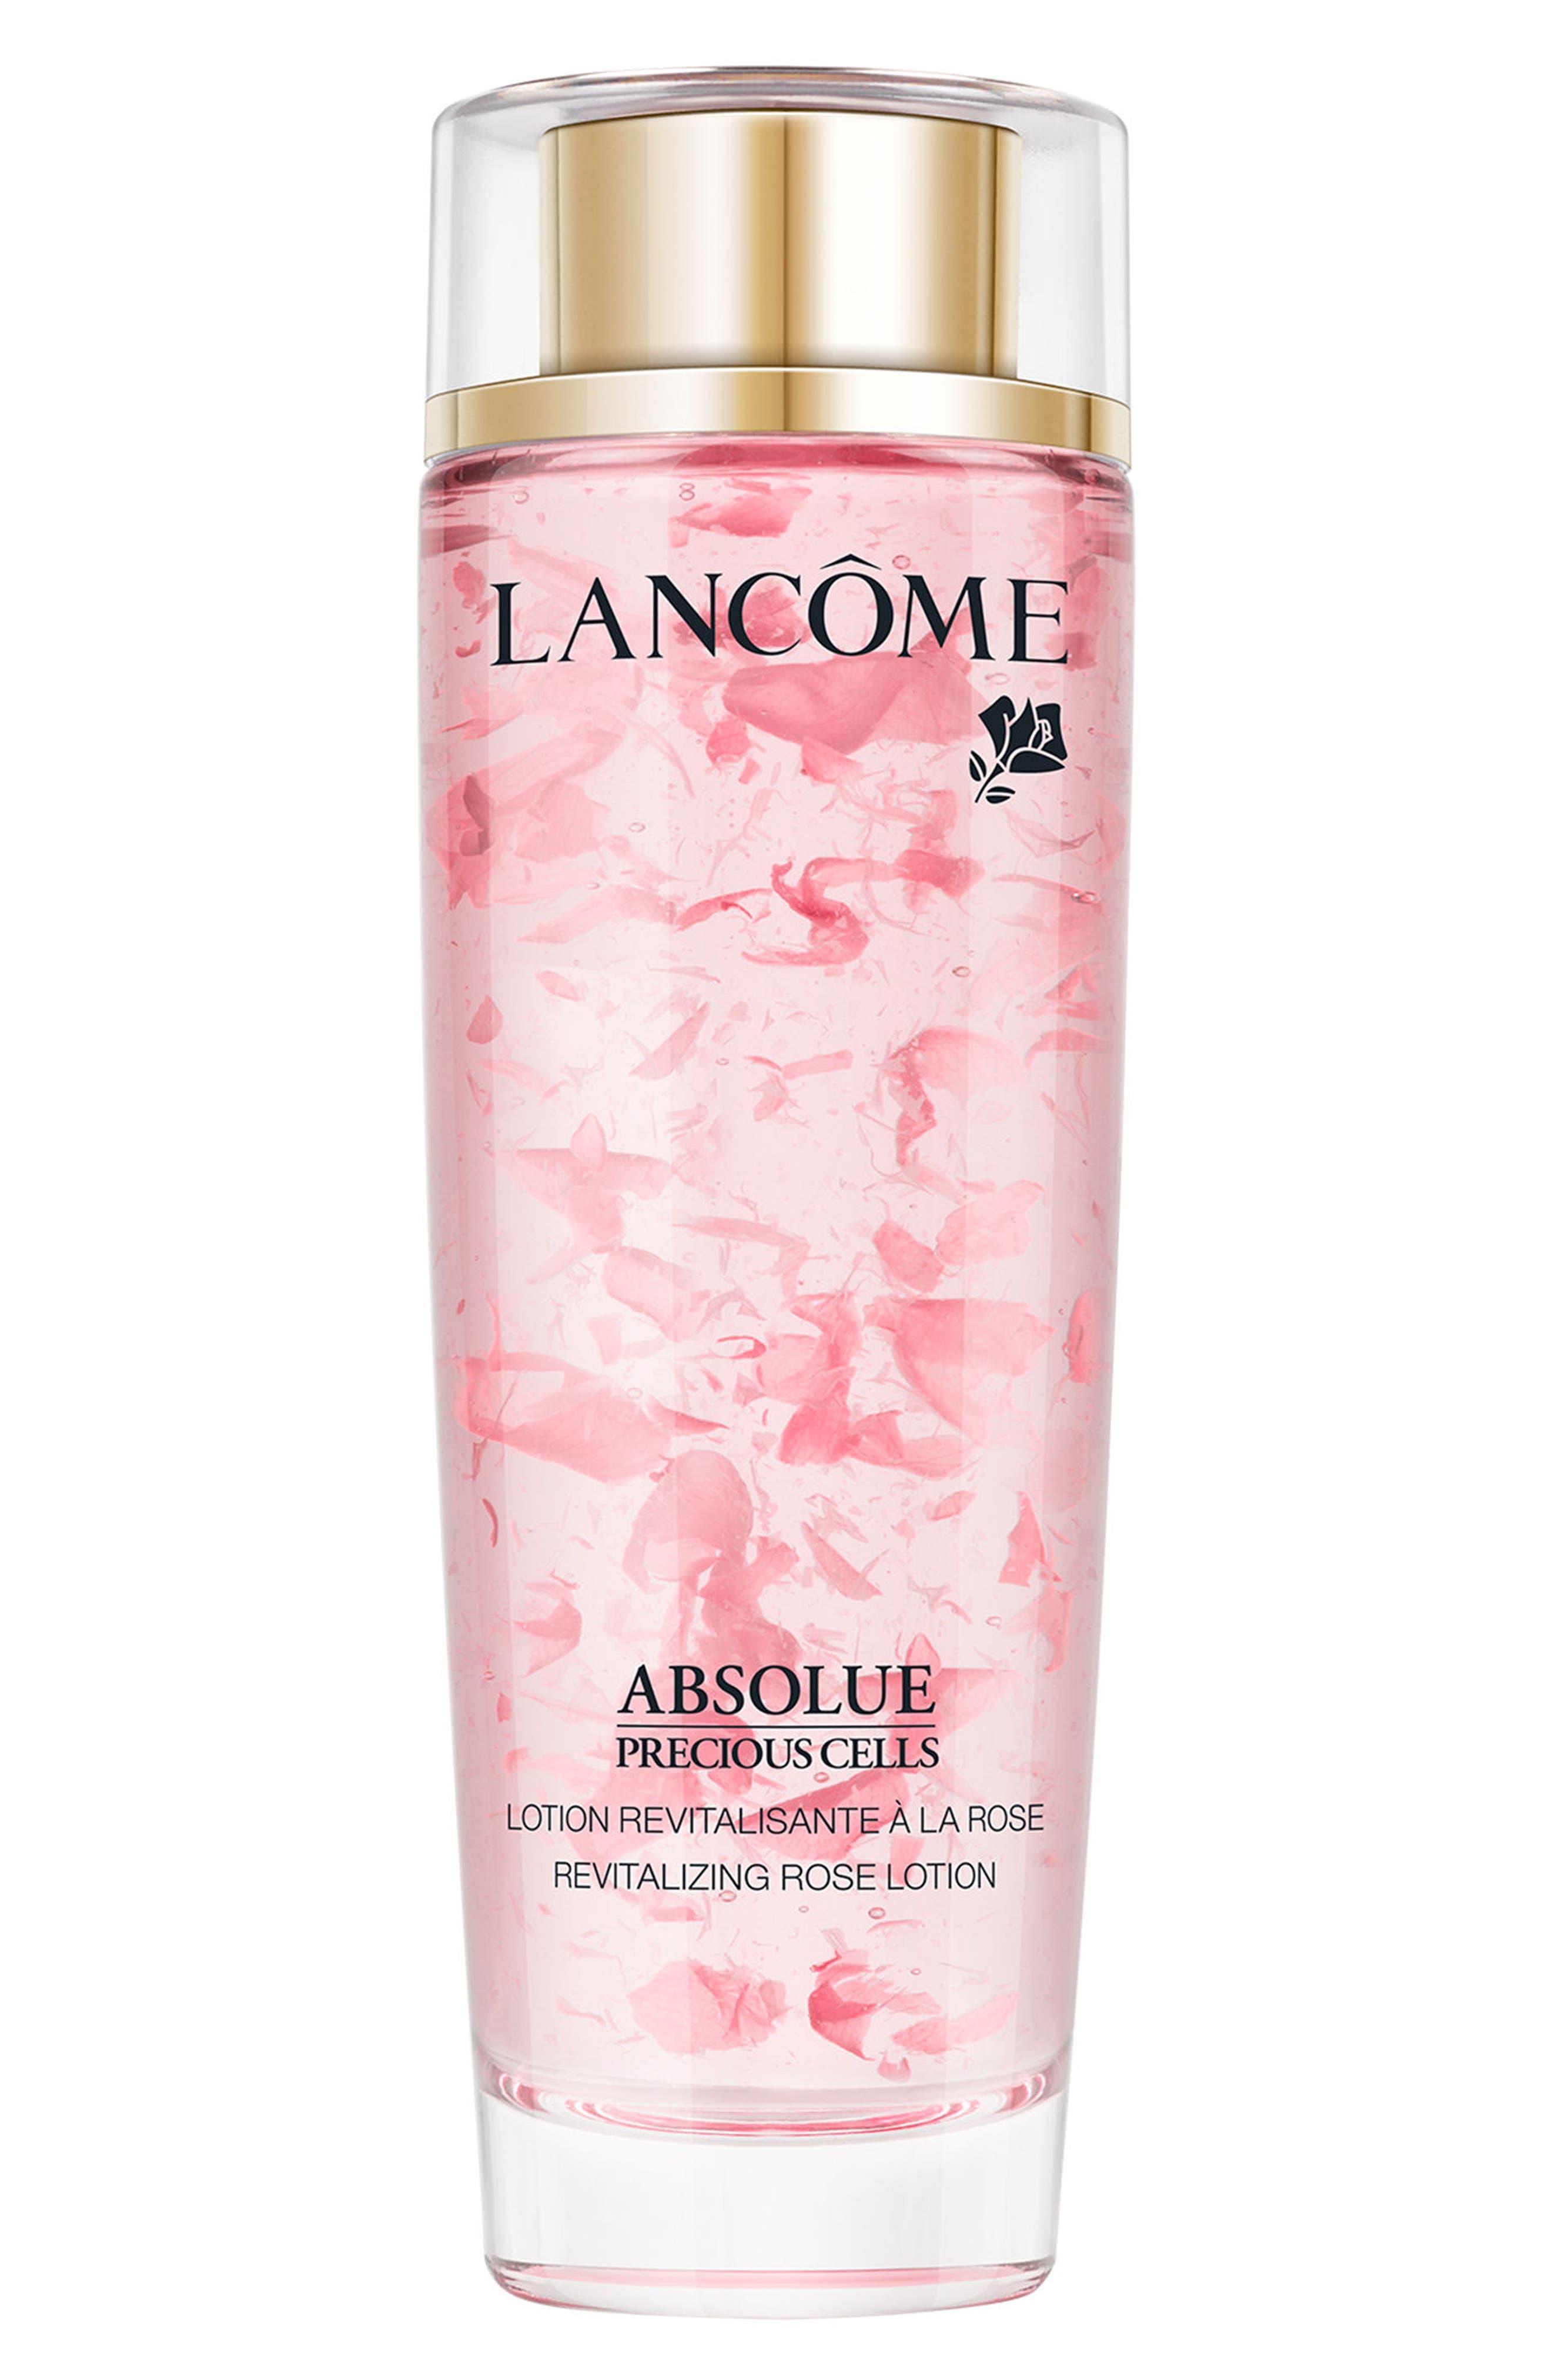 LANCÔME, Absolue Precious Cells Revitalizing Rose Lotion Toner, Main thumbnail 1, color, NO COLOR